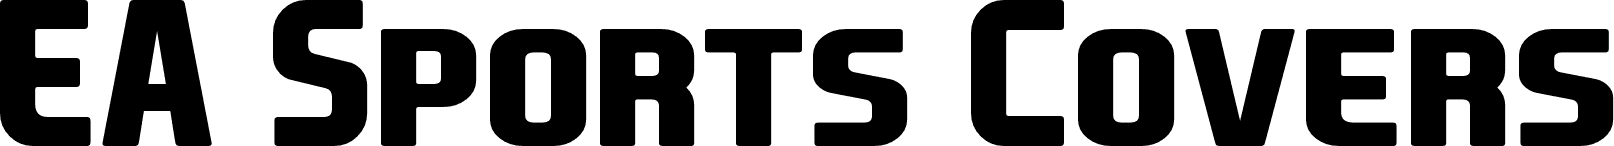 EA Sports Covers SC Bold font